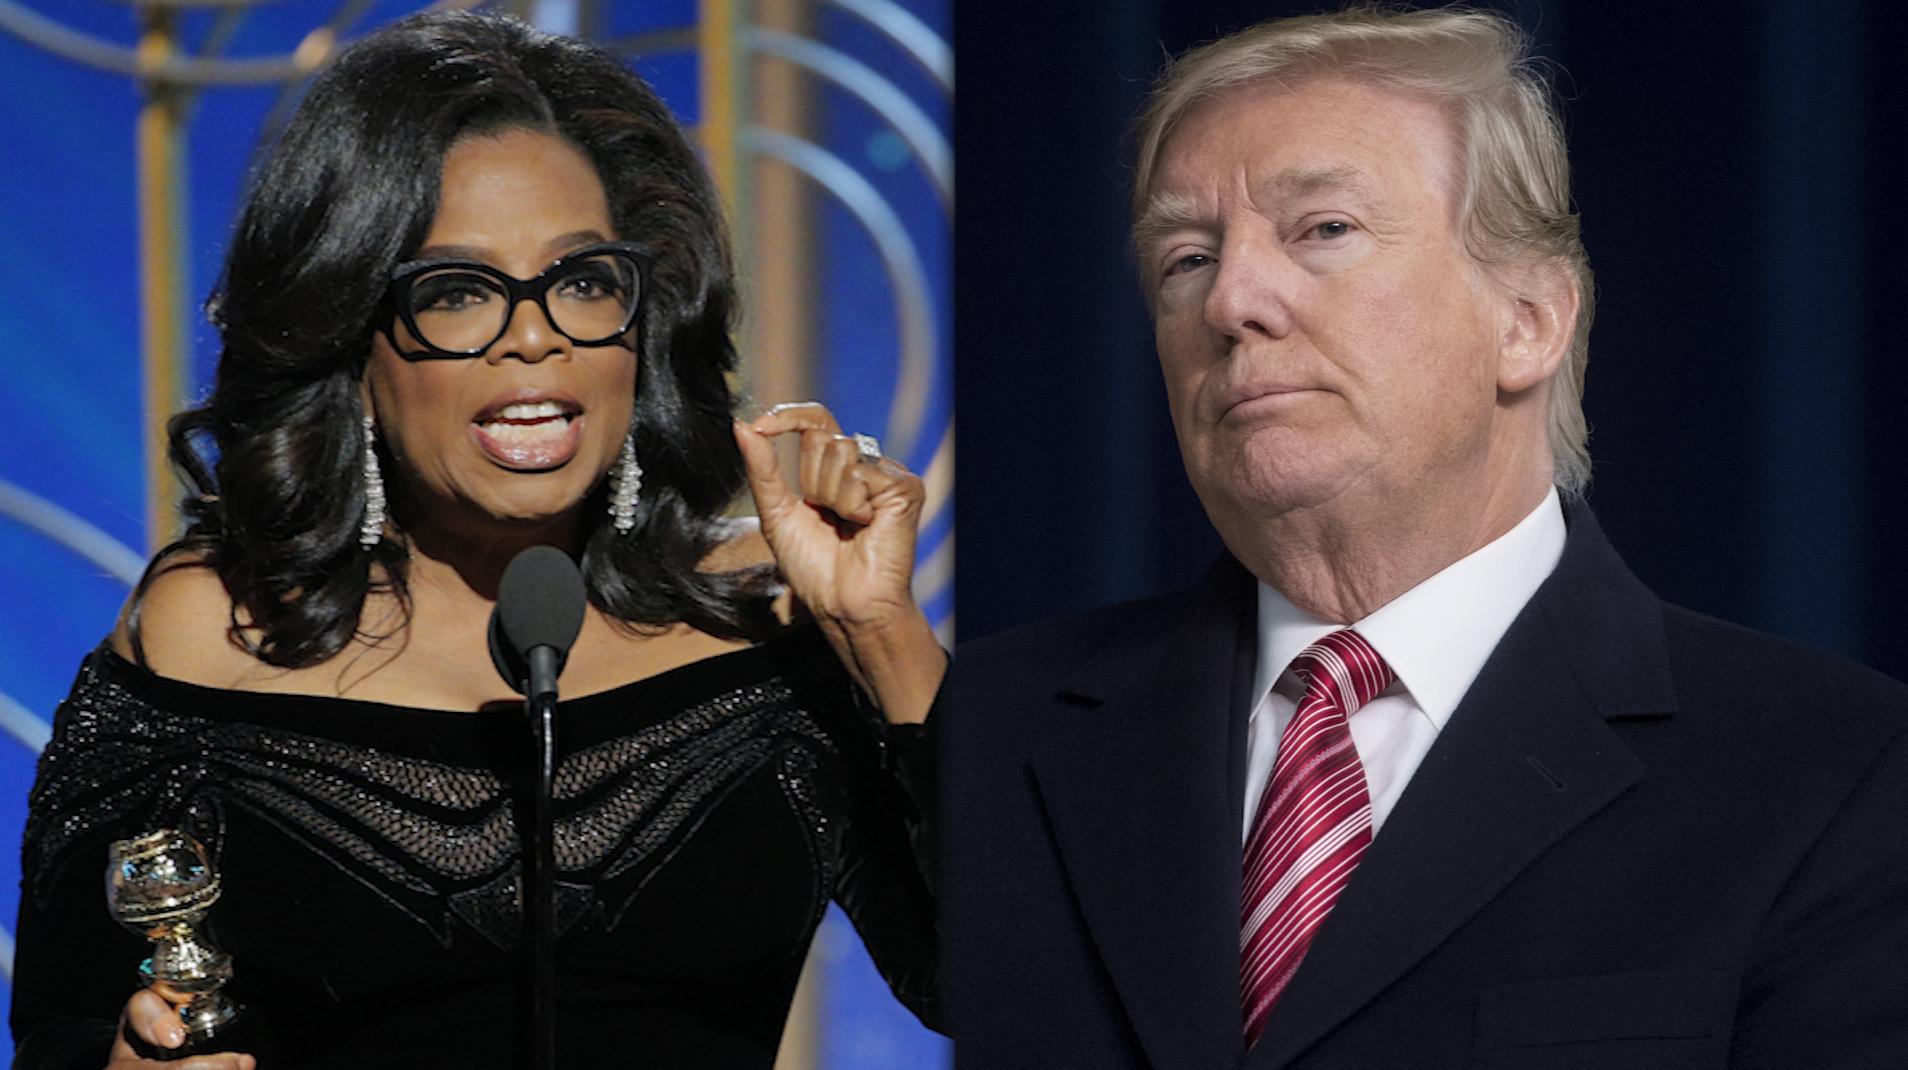 Image result for images of oprah vs trump